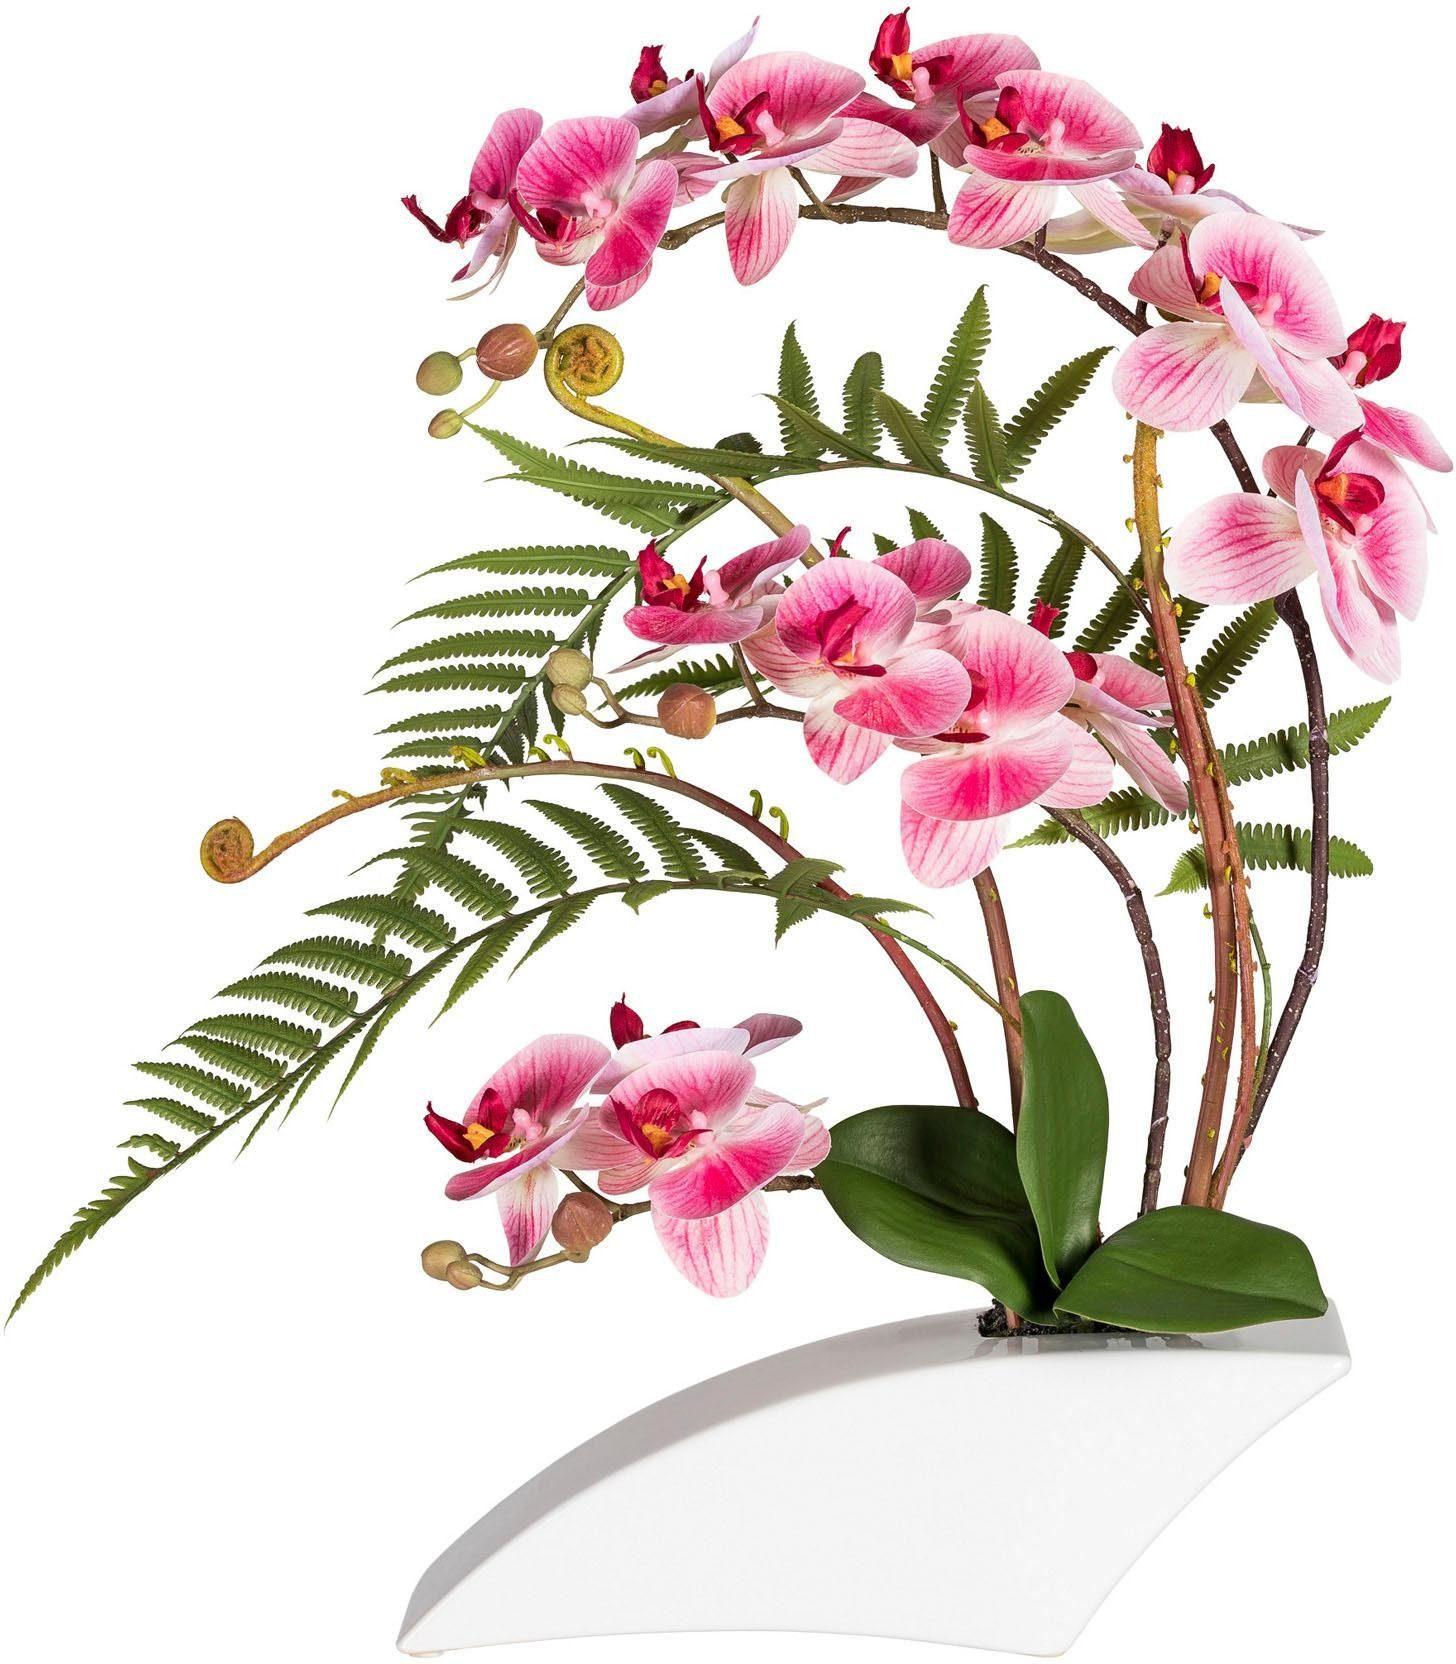 Kunstorchidee »Phalaenopsis«arrangement, ca. 50 cm